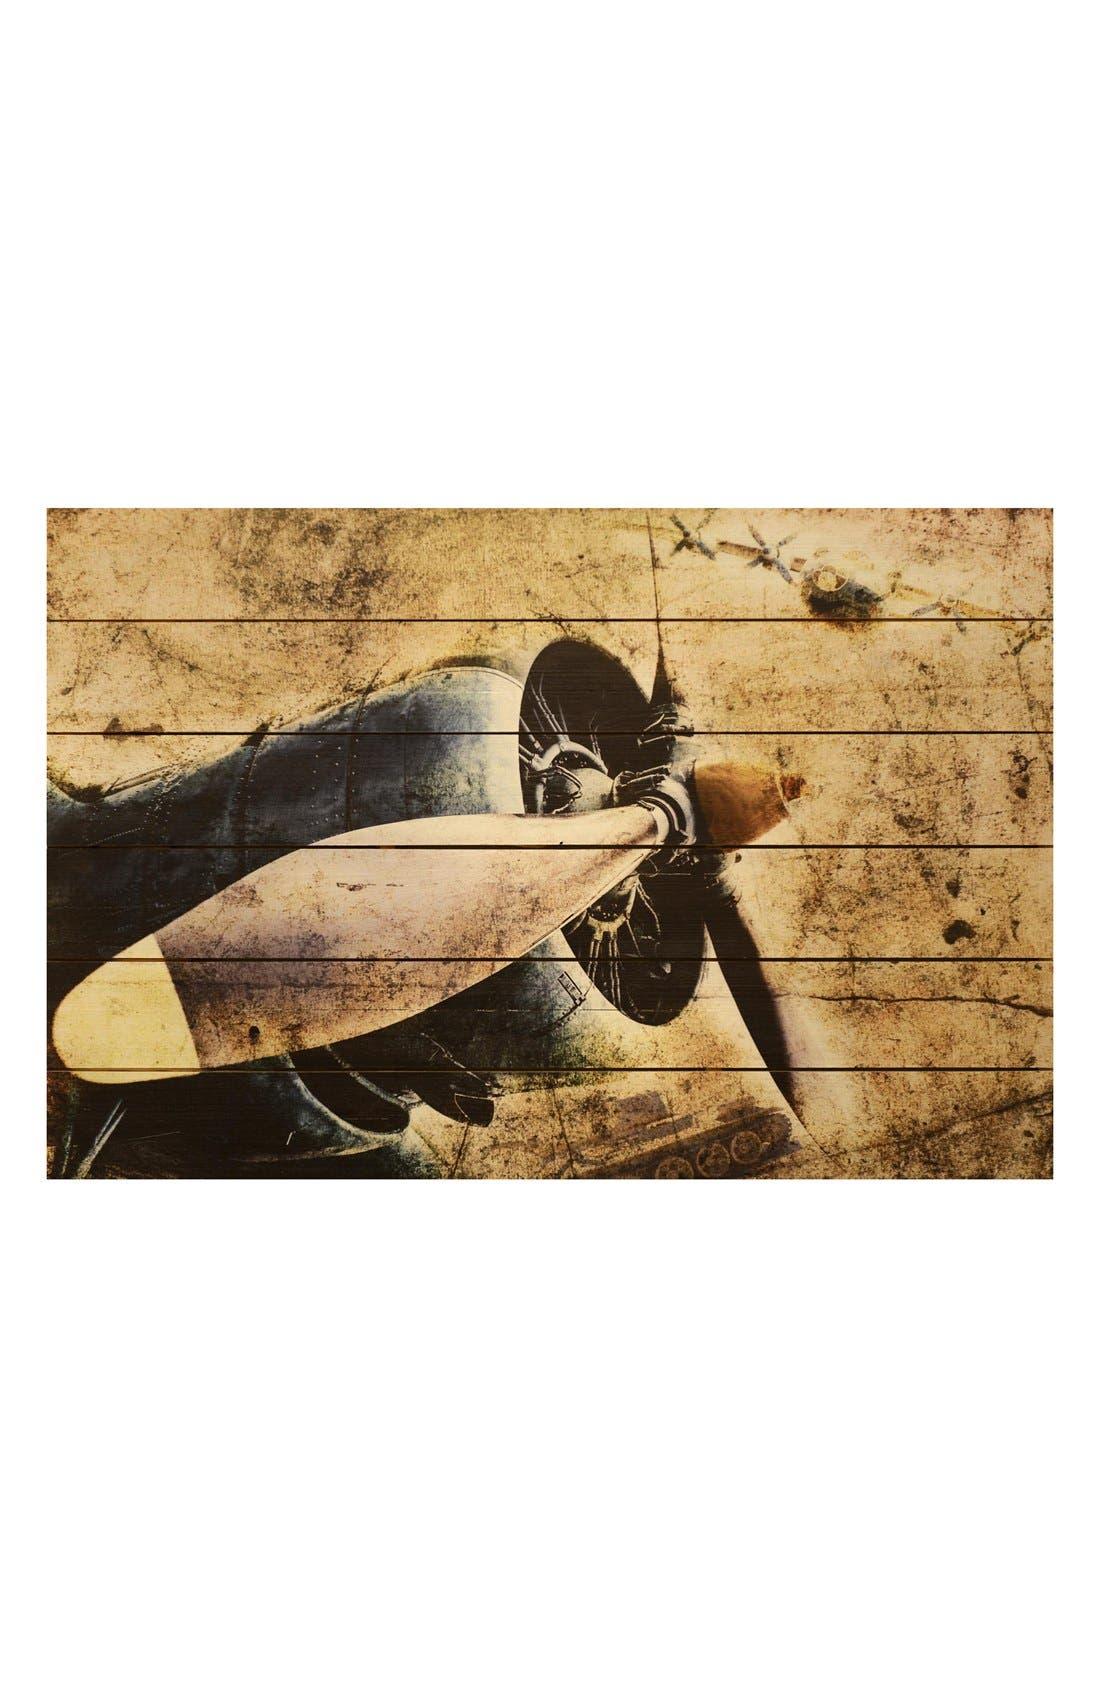 Alternate Image 1 Selected - Empire Art Direct 'Corsair' Wall Art